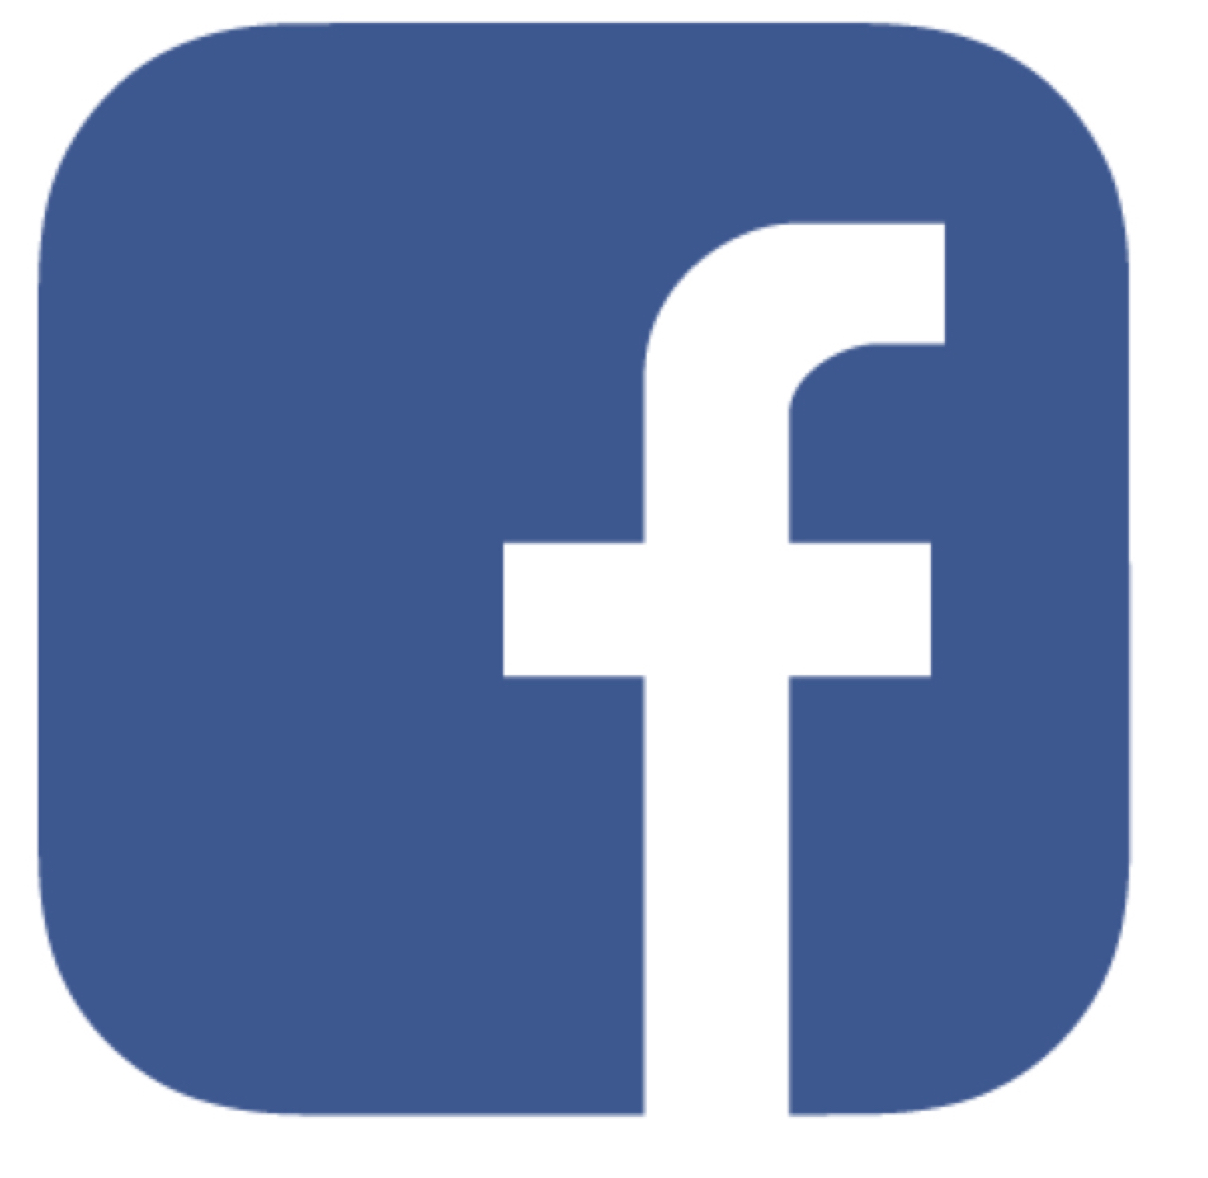 Follow SH20 on Facebook